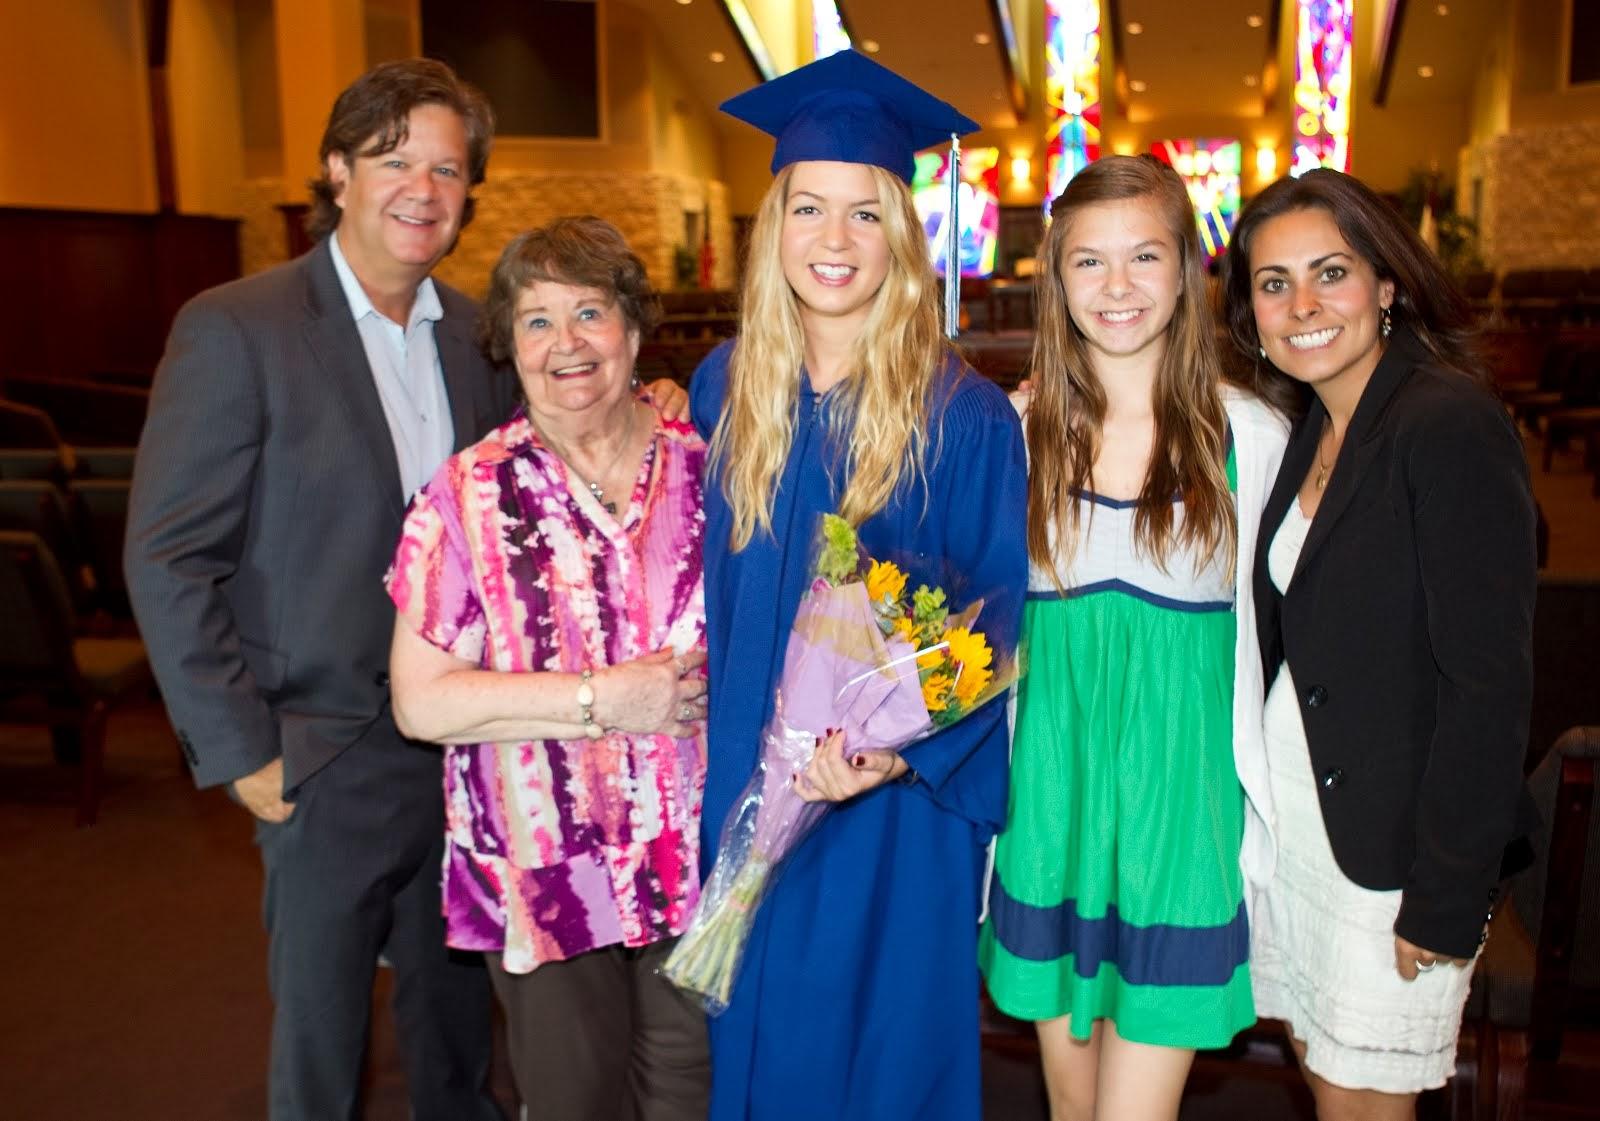 Payton Graduates!